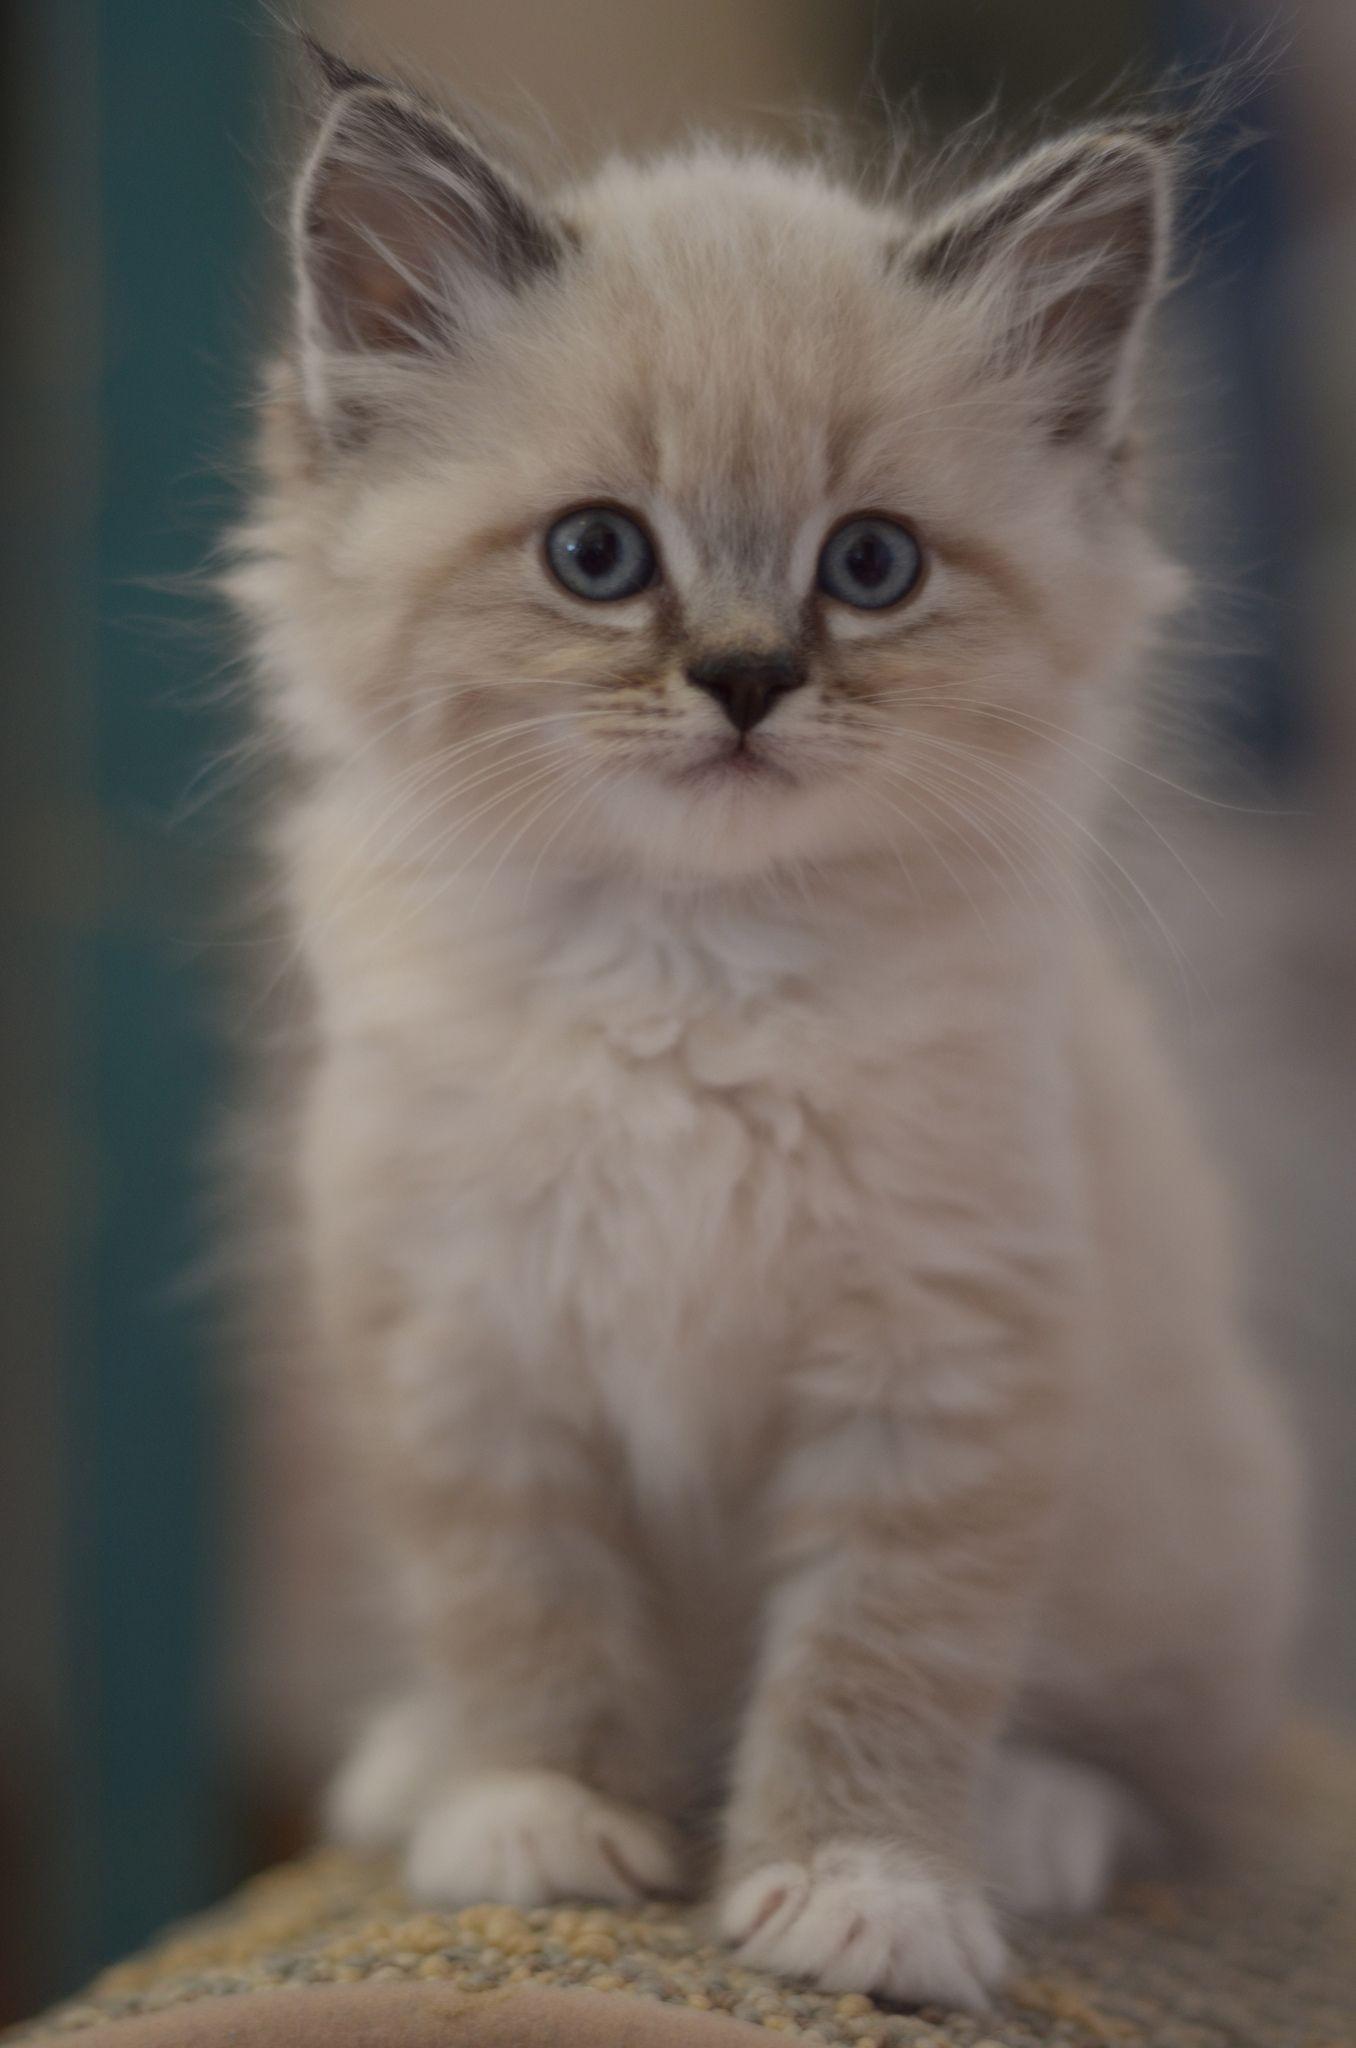 DSC_0061 Kittens cutest, Beautiful cats, Cute fluffy kittens